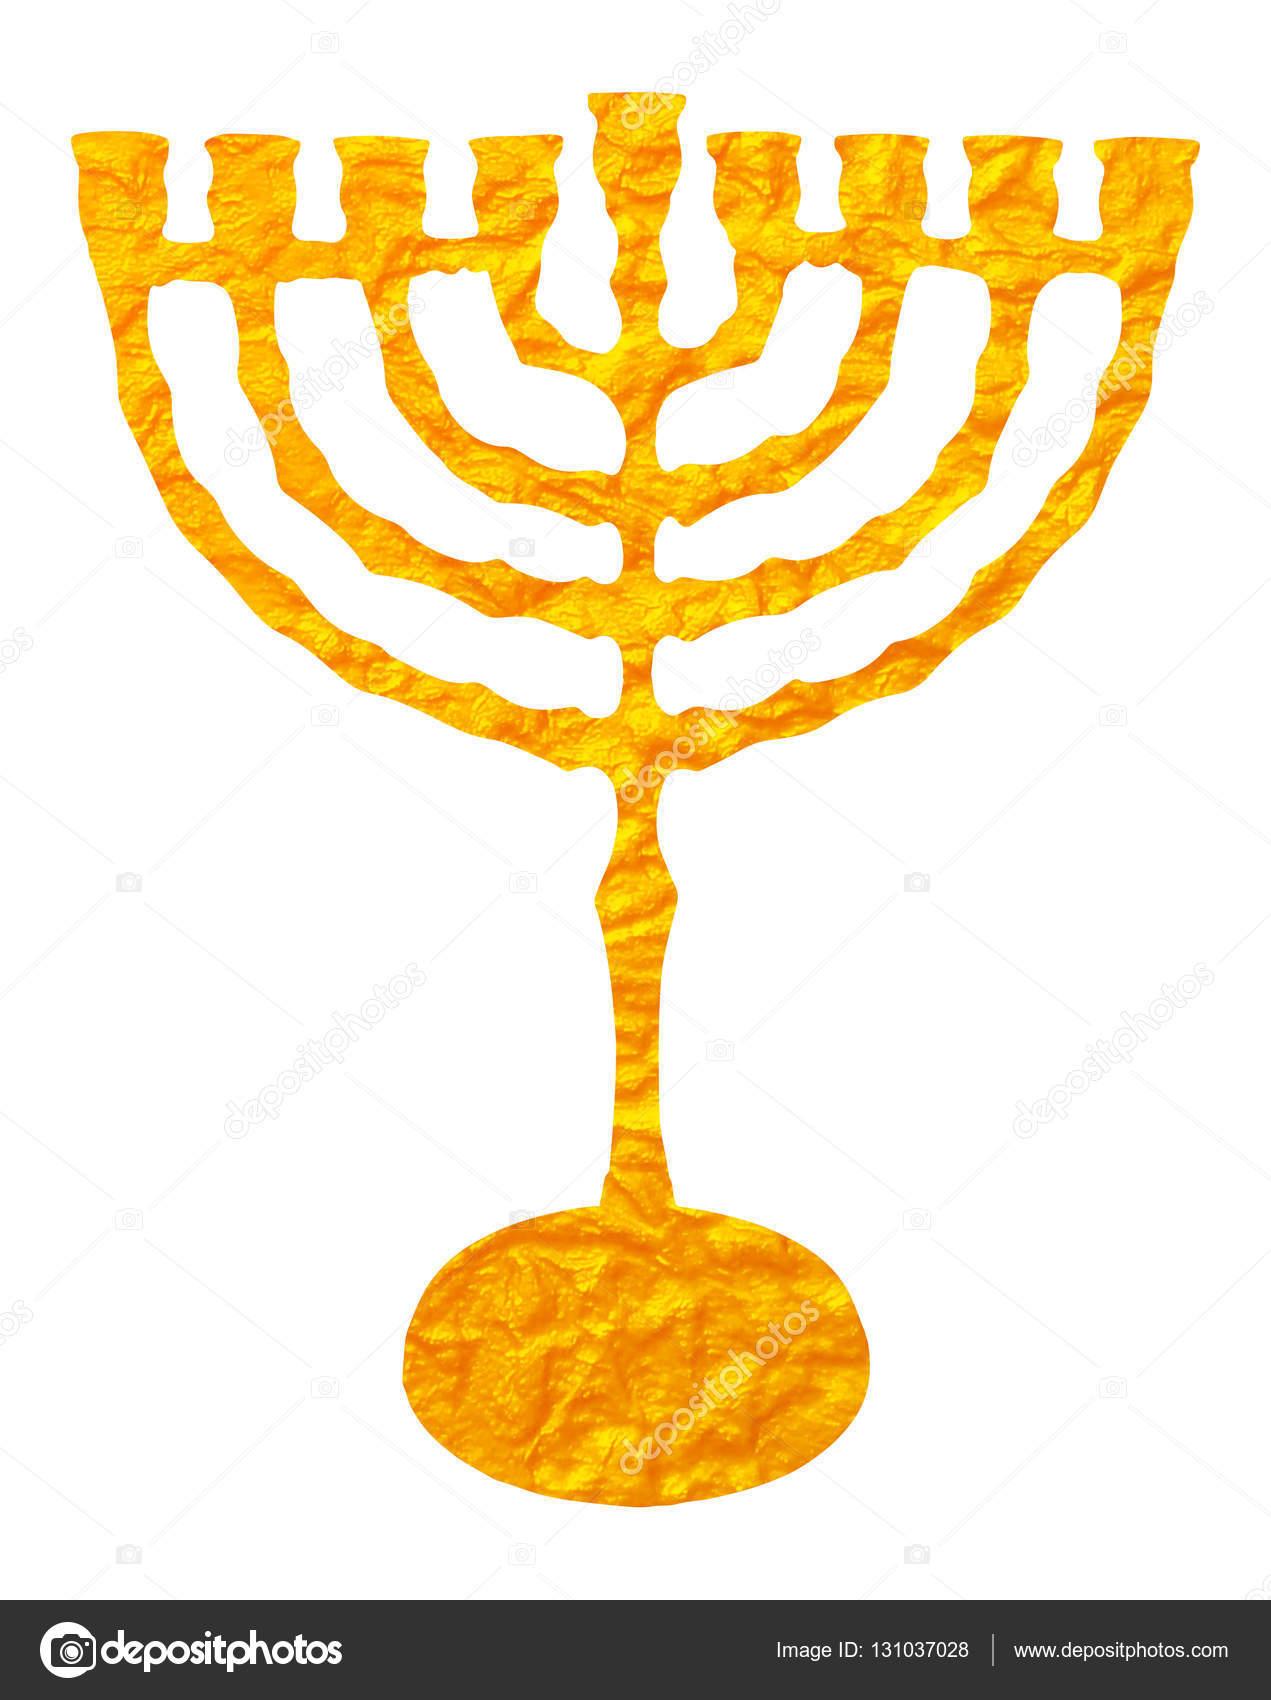 Uncategorized Hanukkah Festival Of Lights Song hanukkah festival of lights jewish holiday menorah traditional candelabra for candles